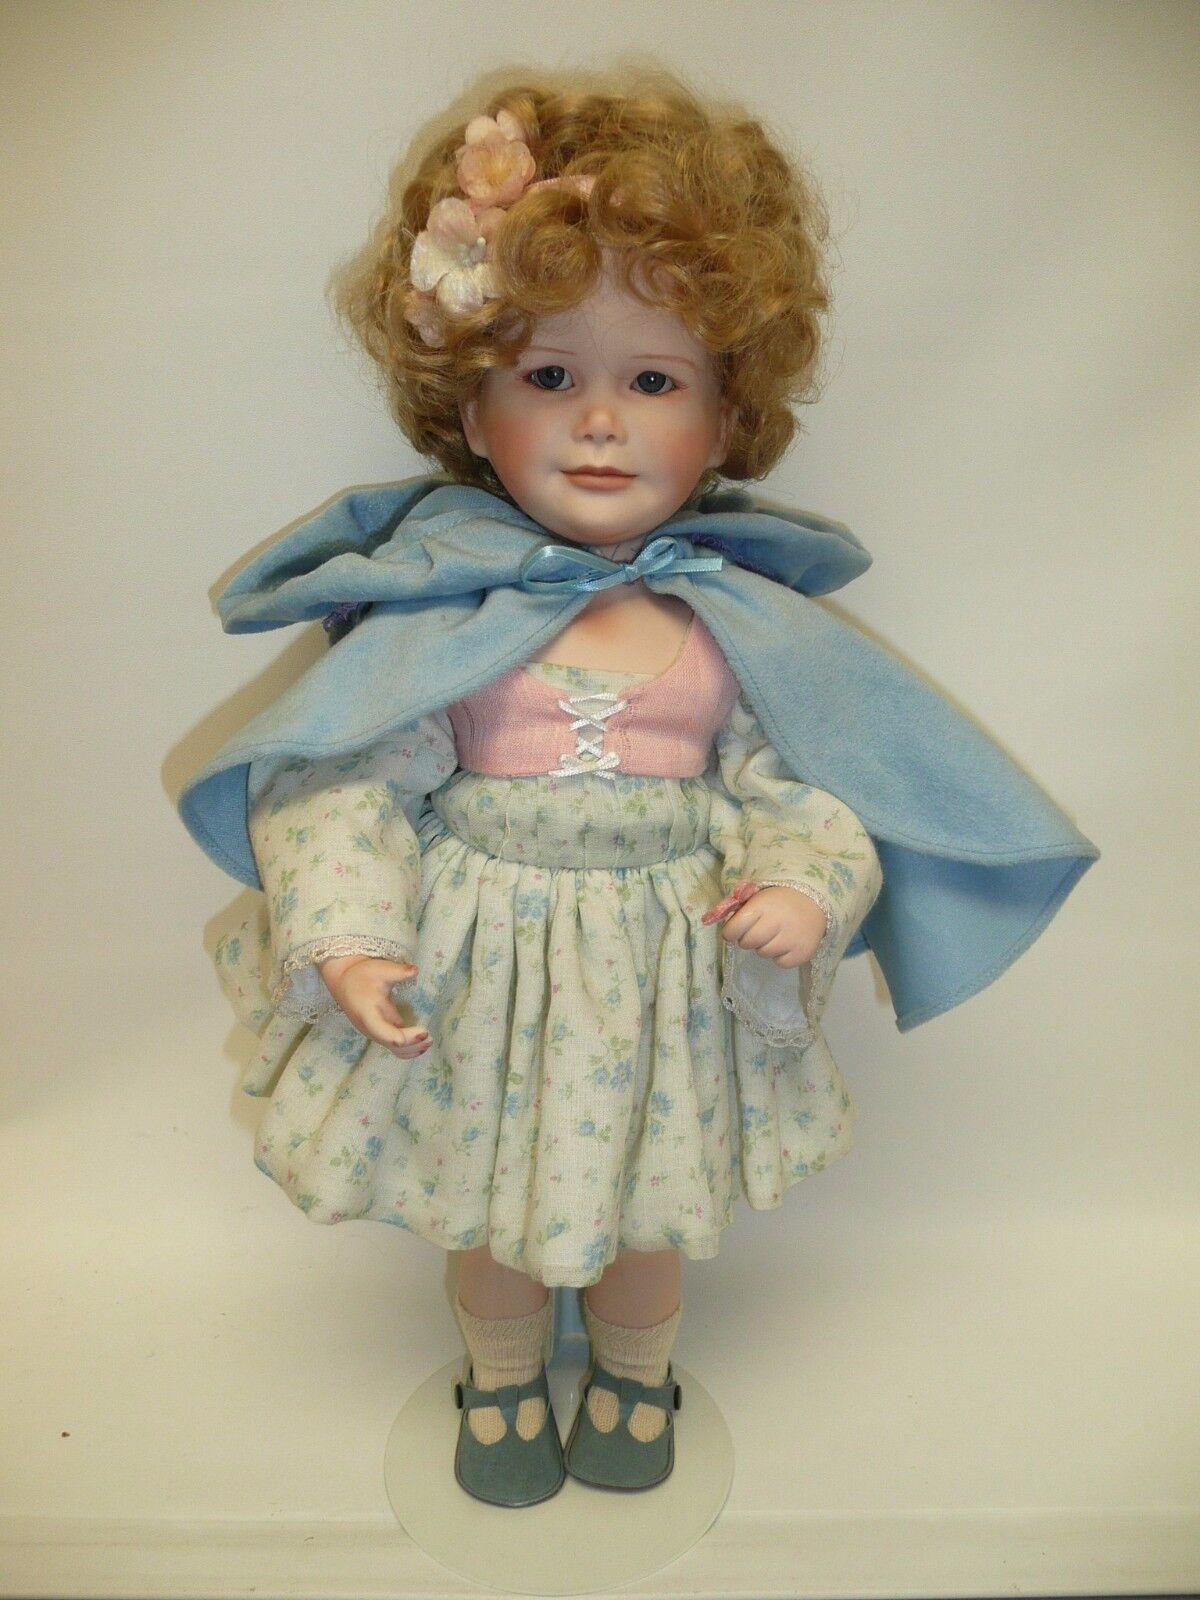 16  Yolanda Bello Porcelain Original Karry-Ann  17 from 1983, All Original